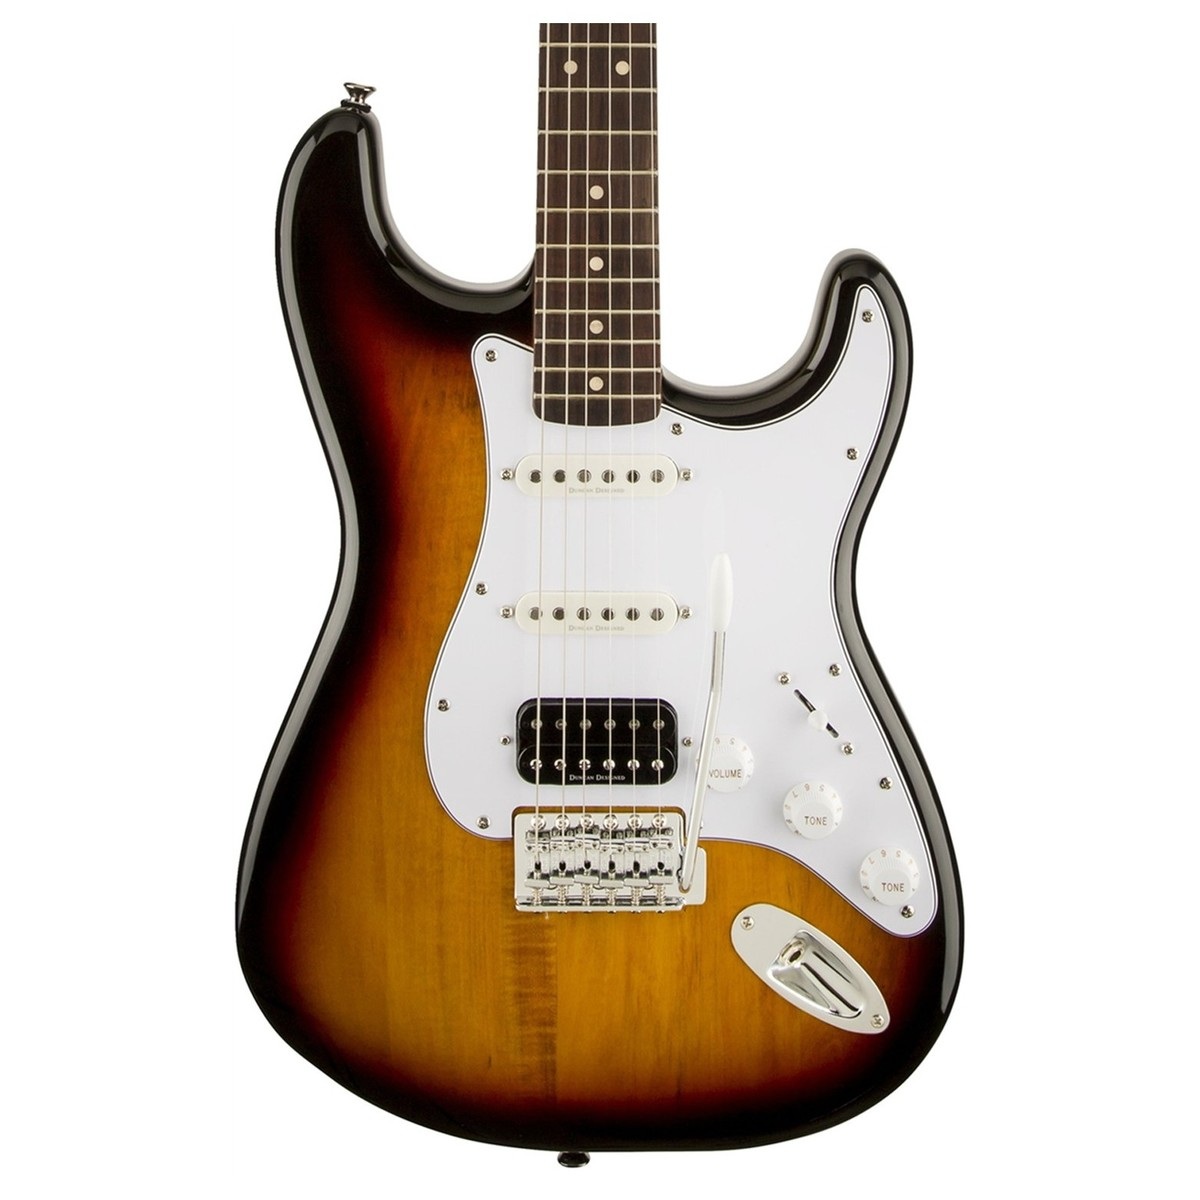 squier vintage modified stratocaster hss 3 tone sunburst at gear4music. Black Bedroom Furniture Sets. Home Design Ideas